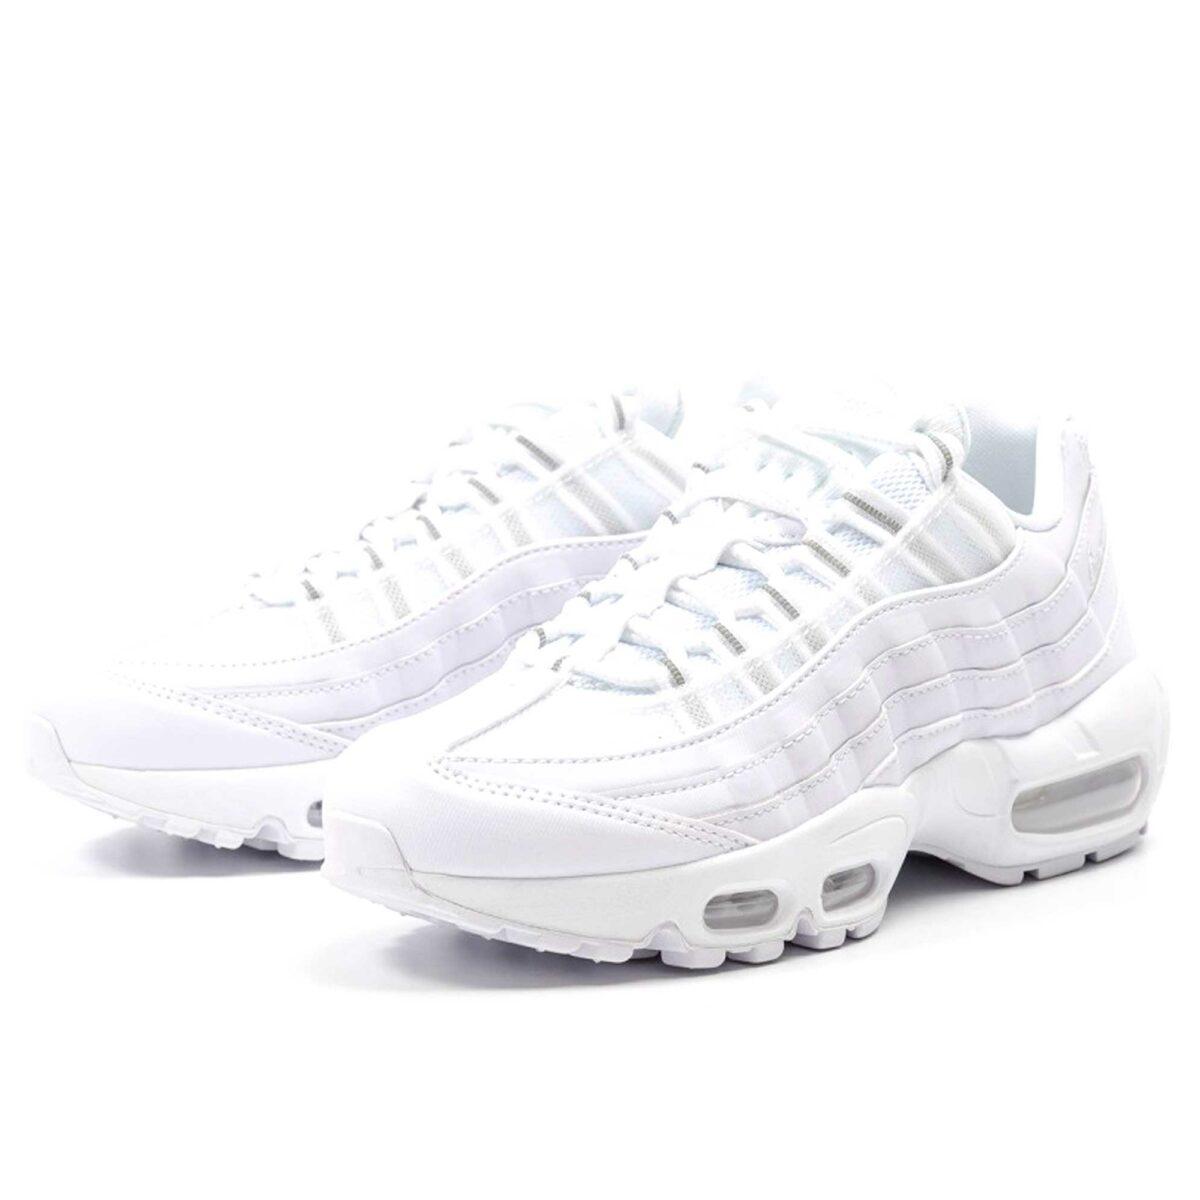 nike wmns air max 95 white 307960-106 купить